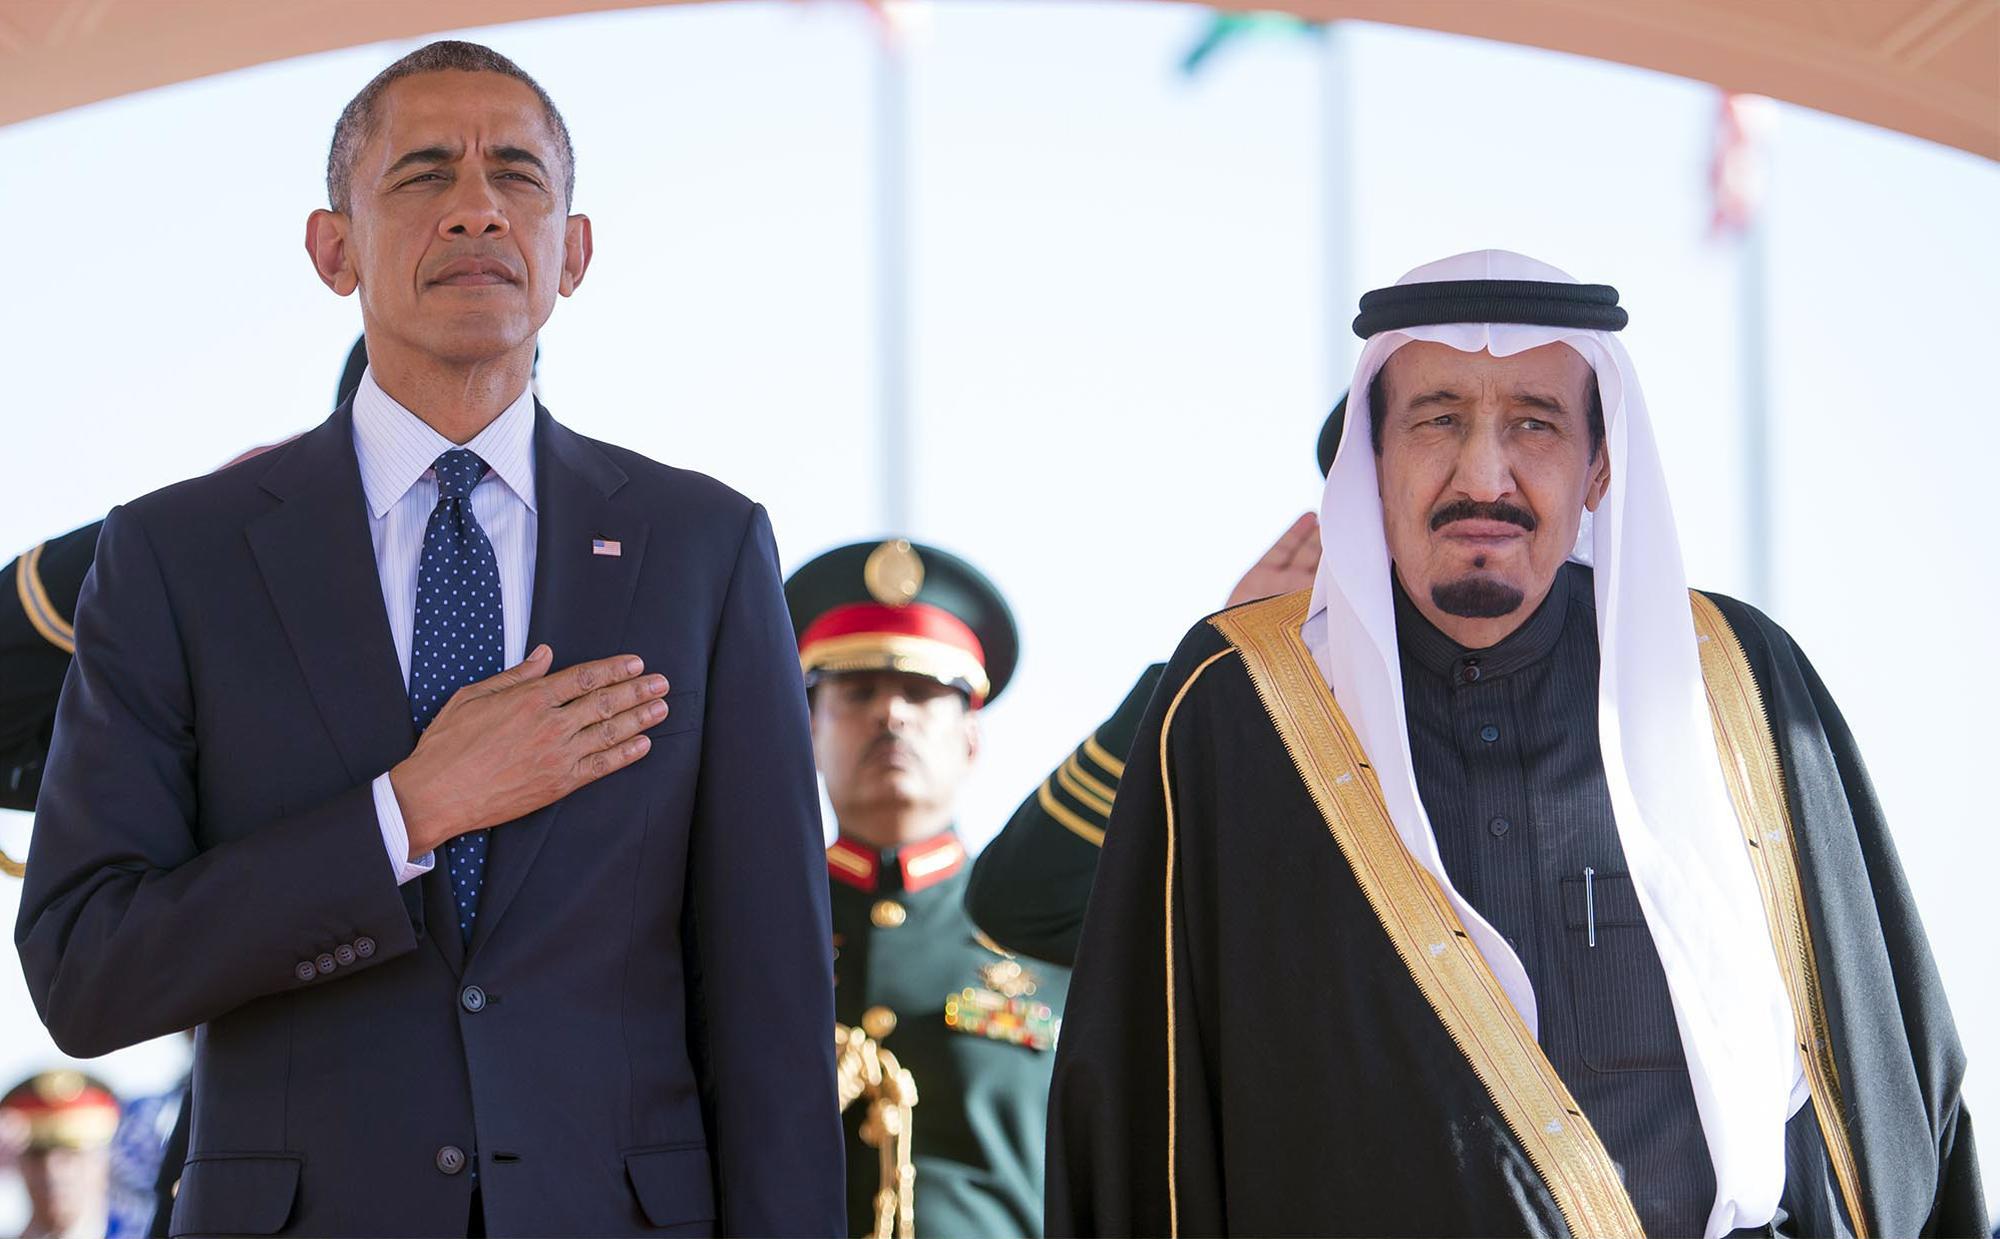 Founding King Abdulaziz Al-Saud and J. Kennedy 55